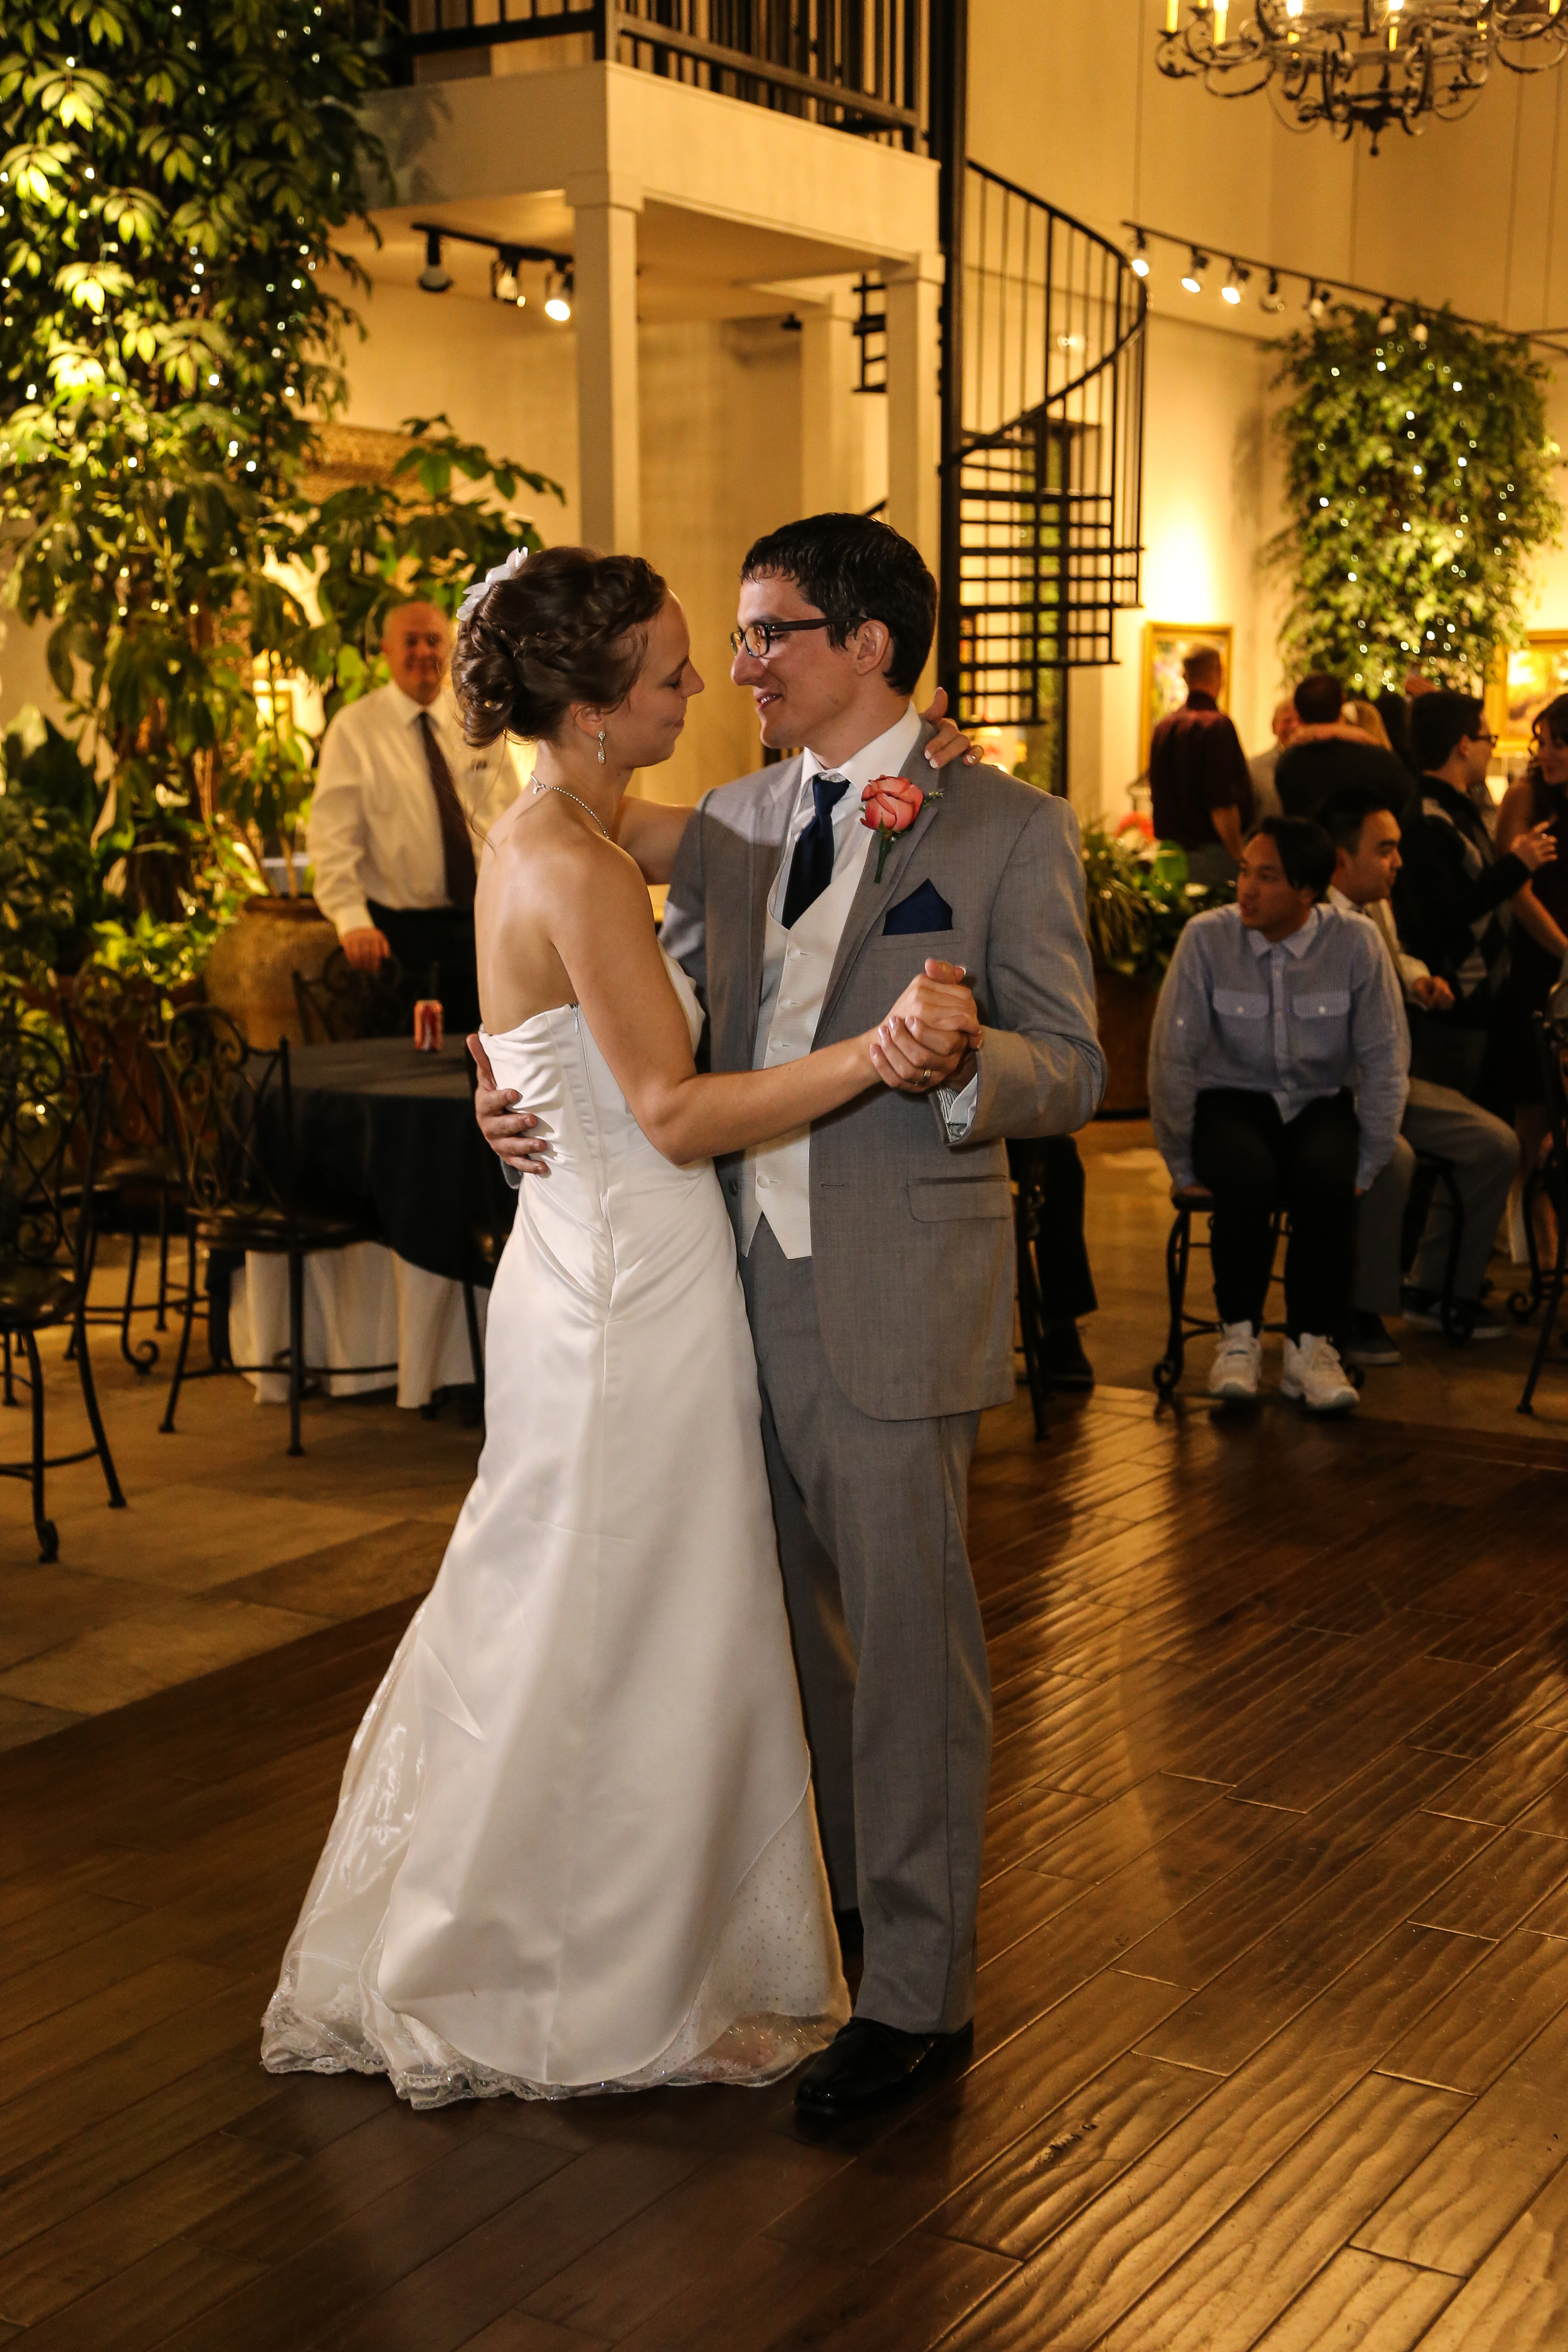 Wedding reception dance by Bountiful wedding photographer, Wasatch Portrait Photography